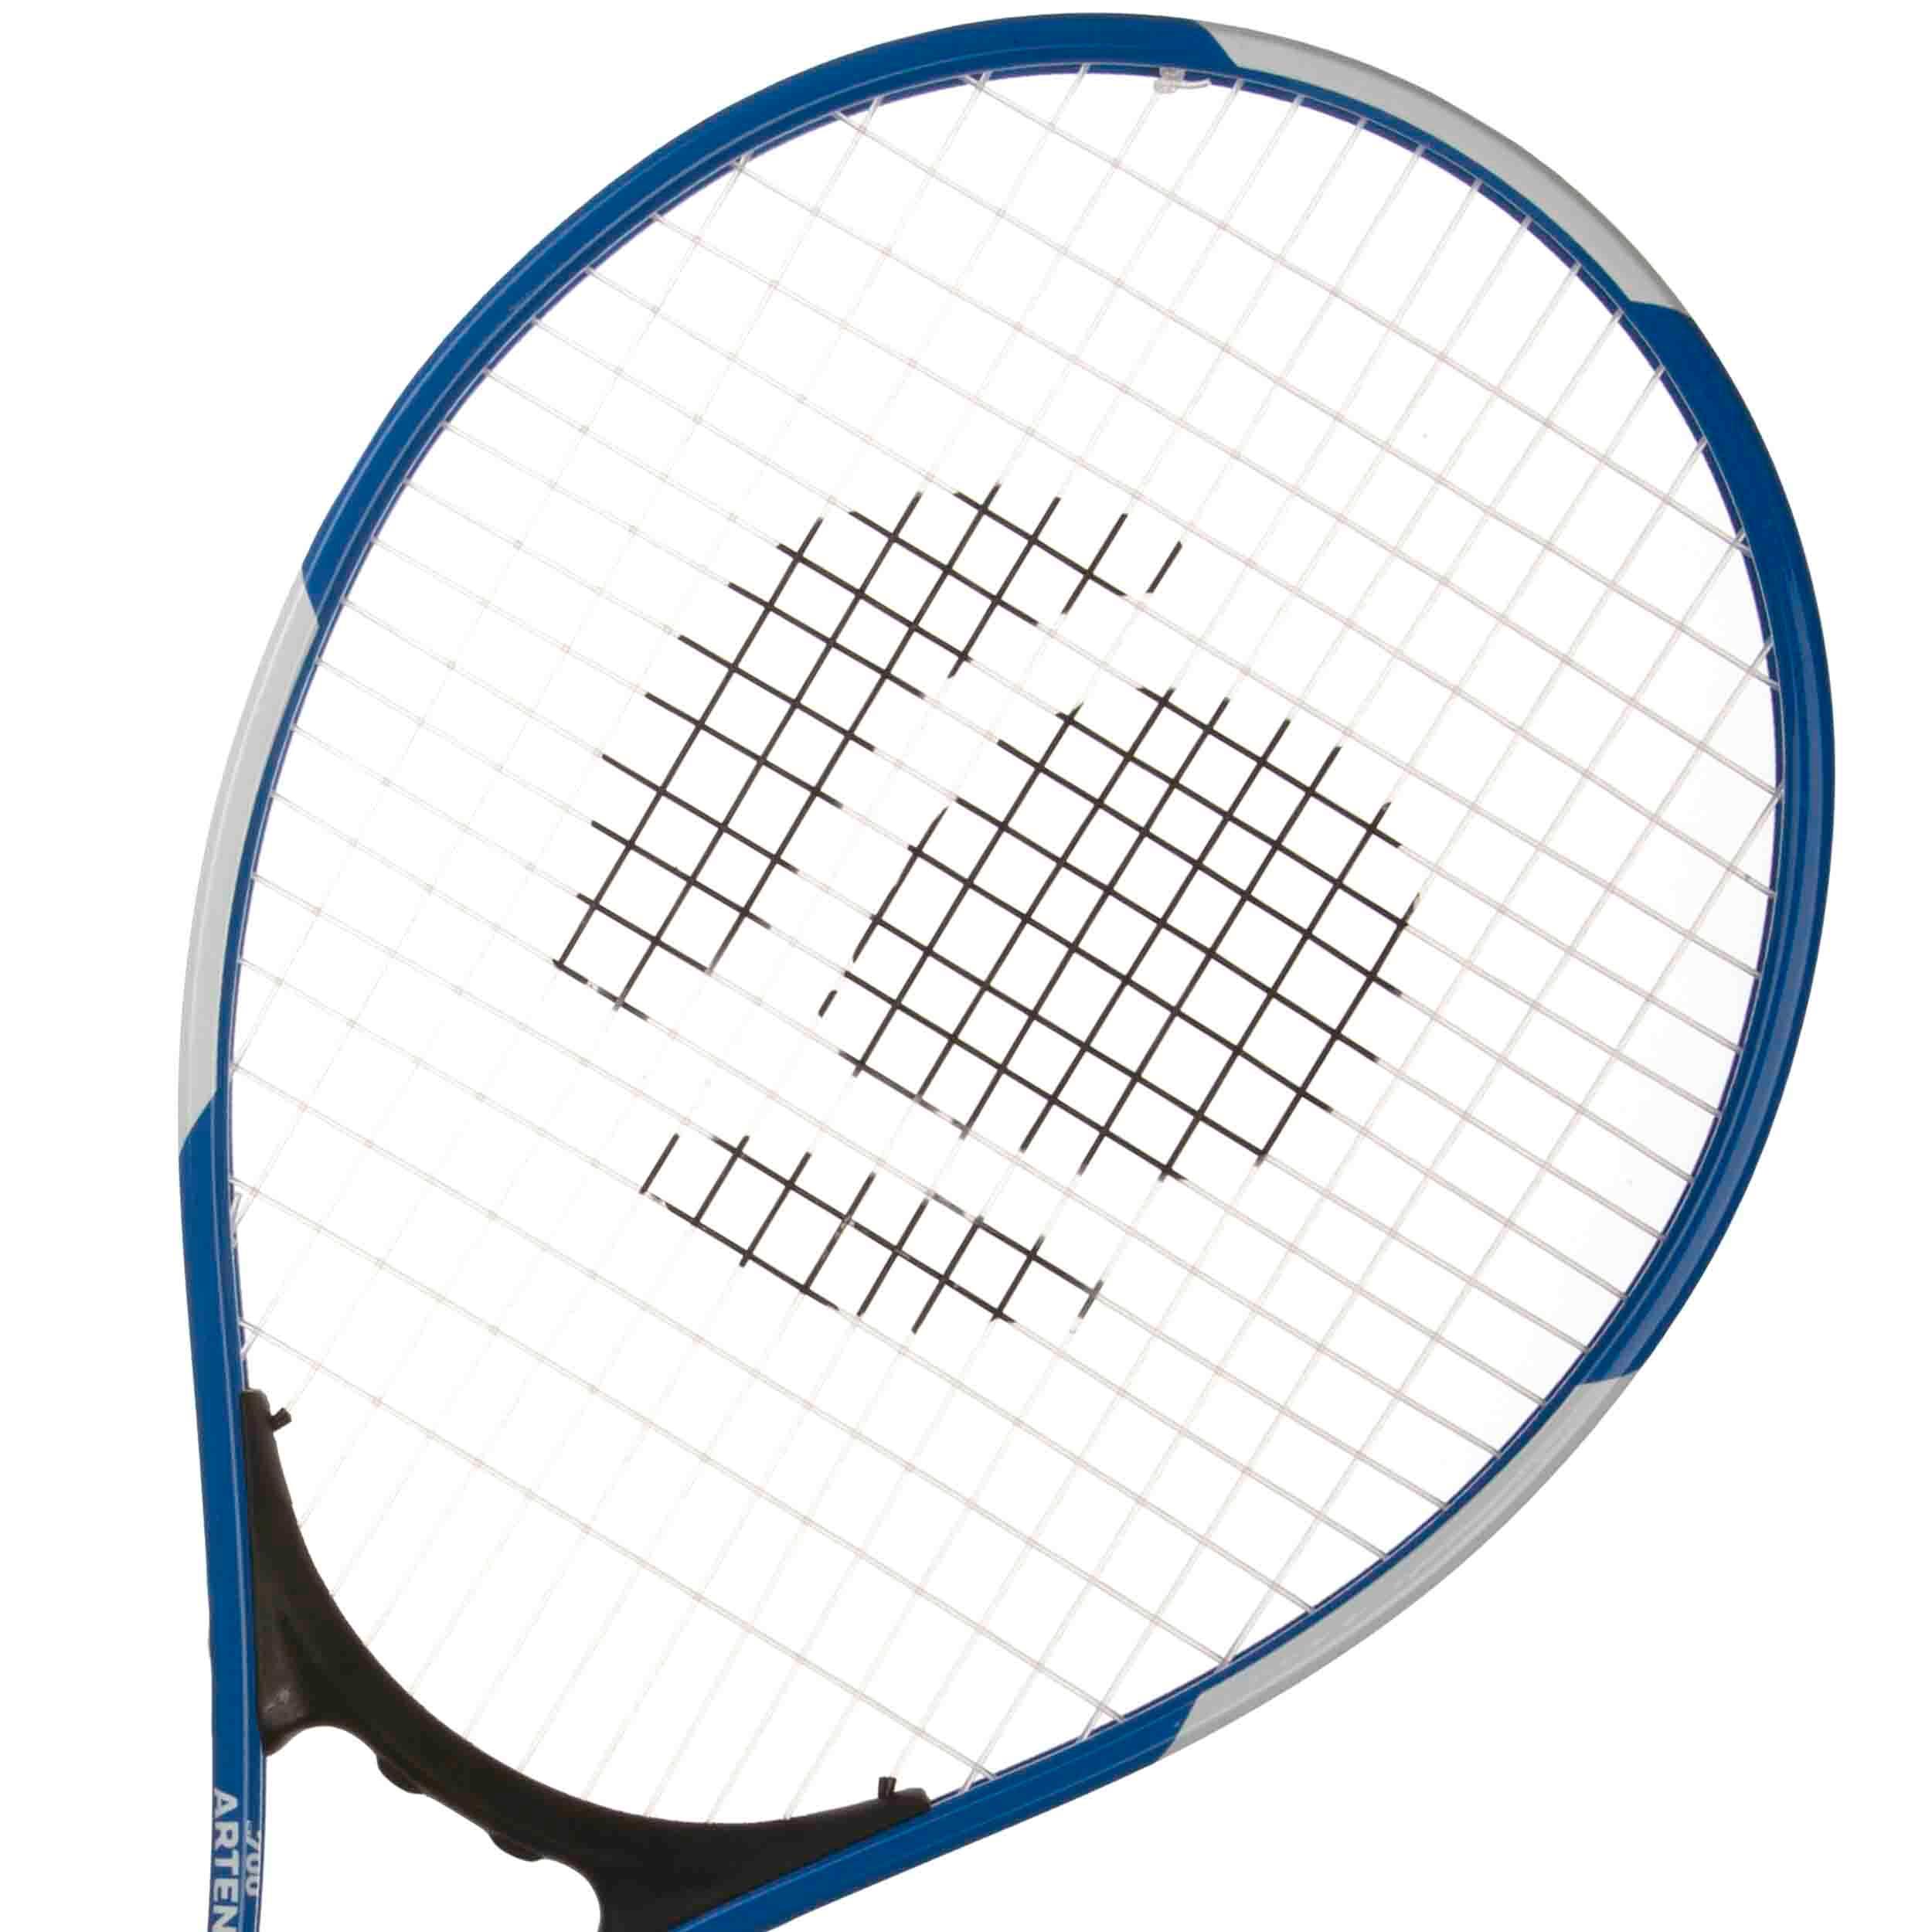 TR100 23 Kids' Tennis Racket - Blue